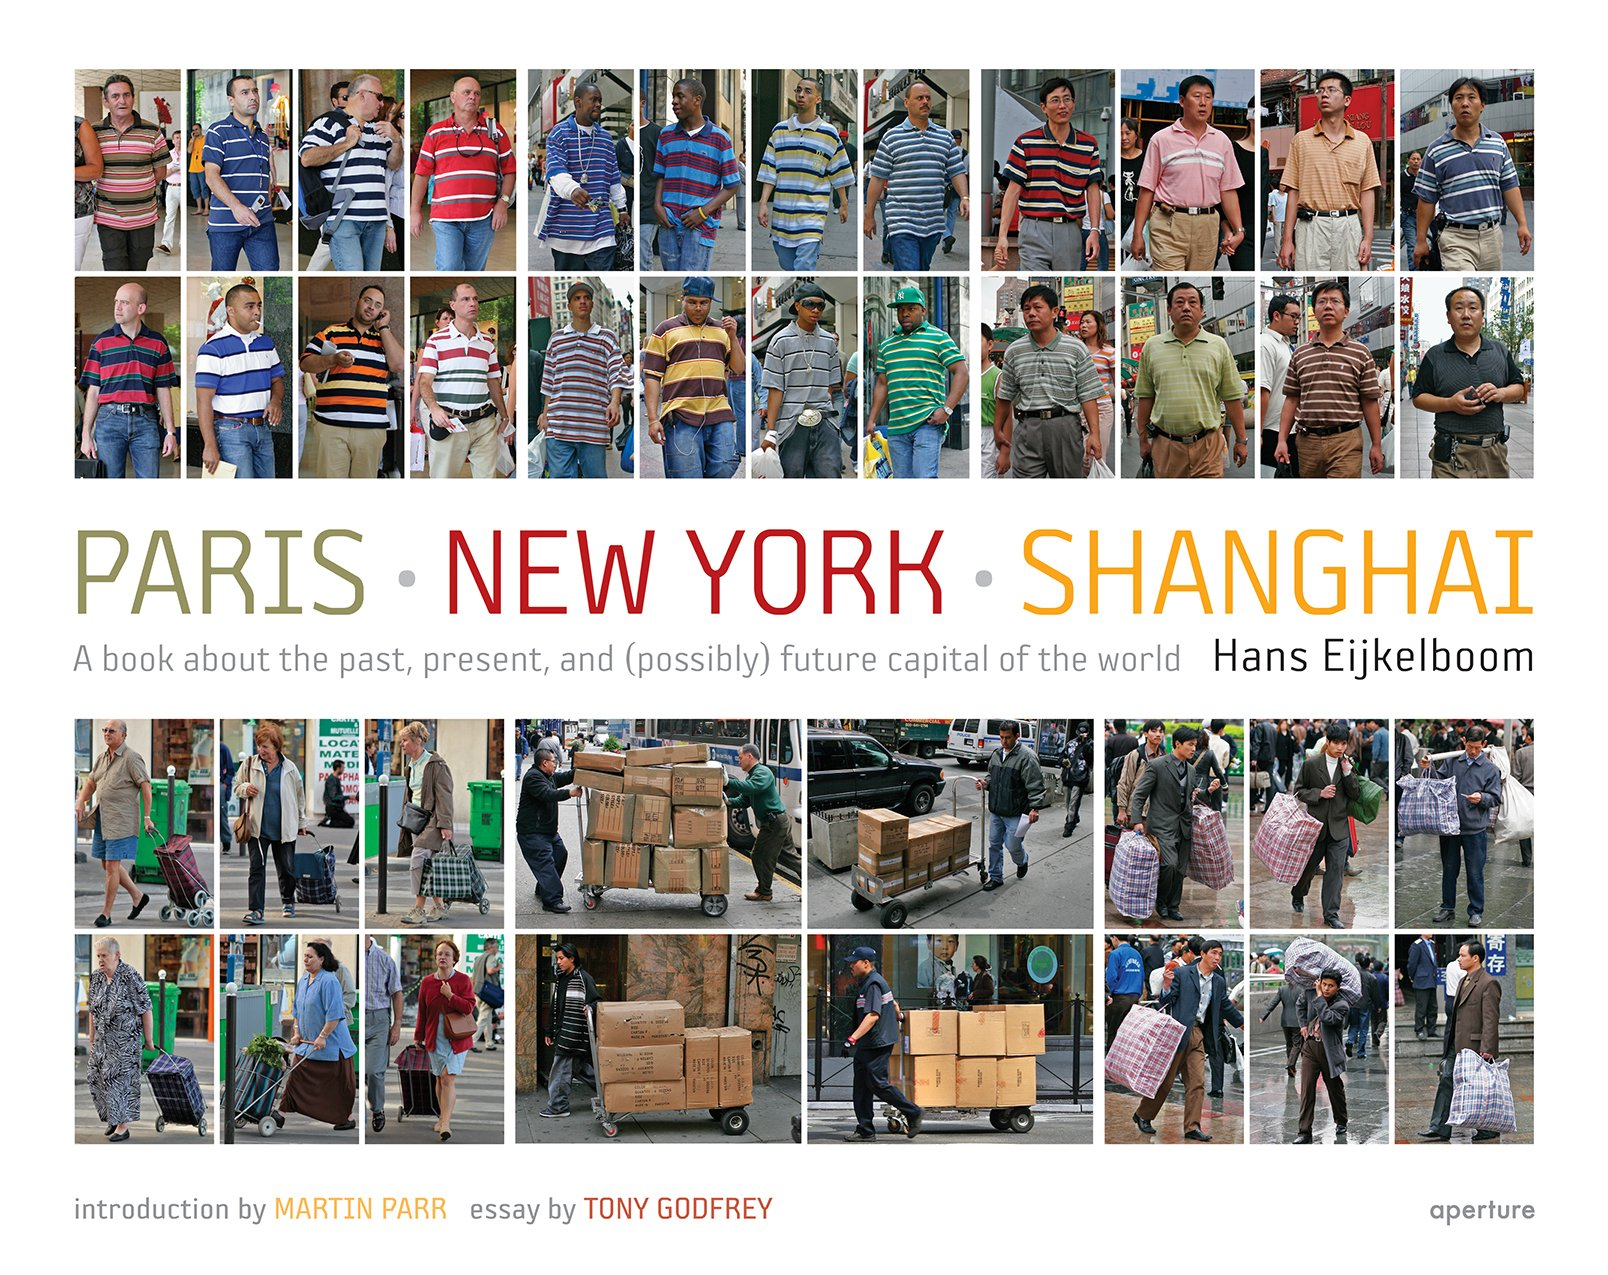 Hans Eijkelboom: Paris-New York-Shanghai ebook